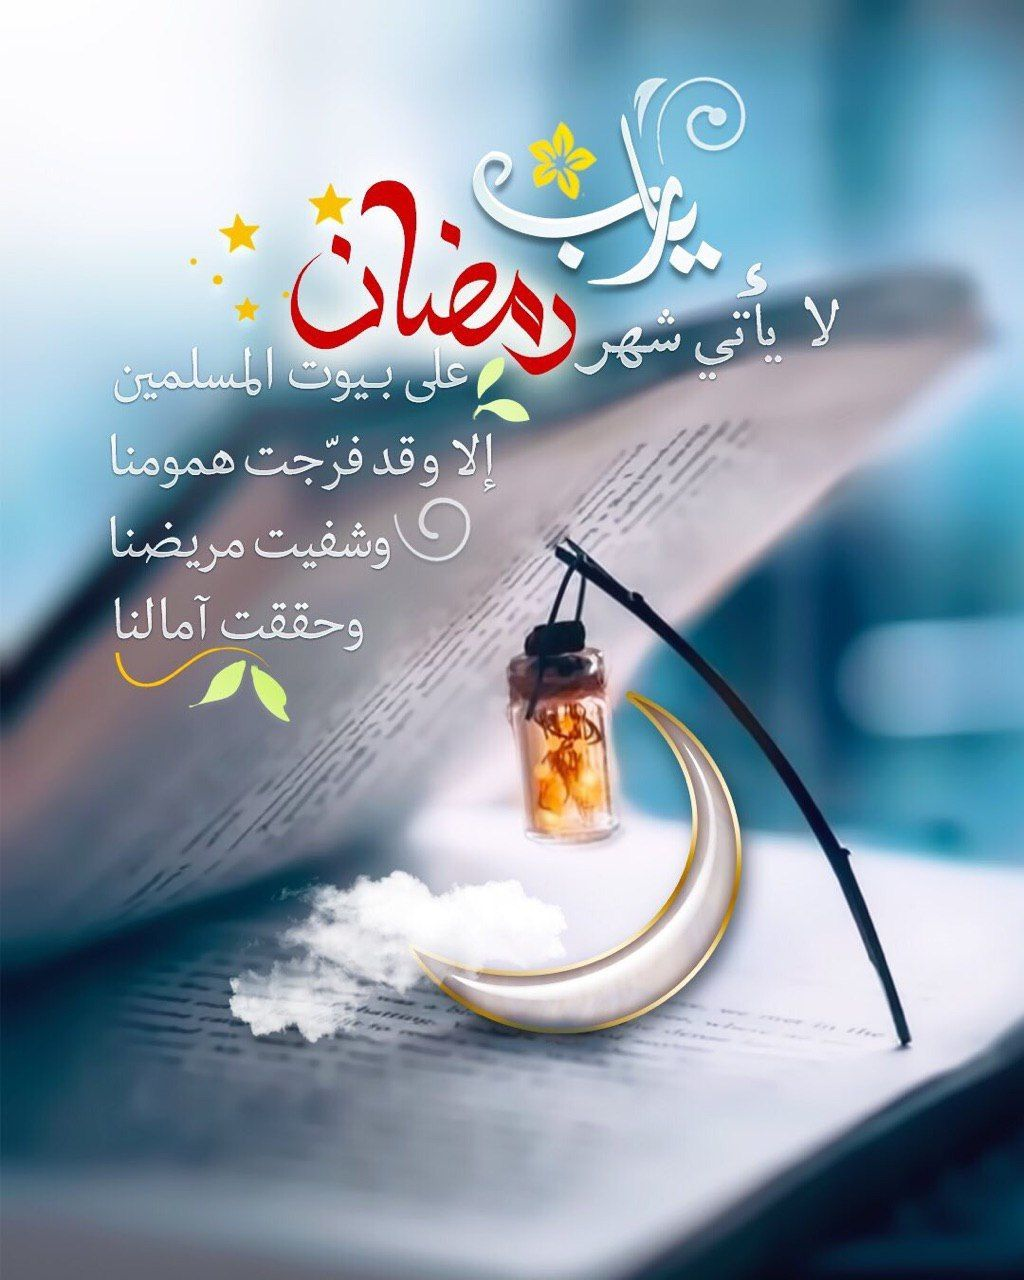 احلى صور شهر رمضان 2021 صور رمضان كريم Ramadan Kareem Pictures Ramadan Kareem Decoration Ramadan Gifts